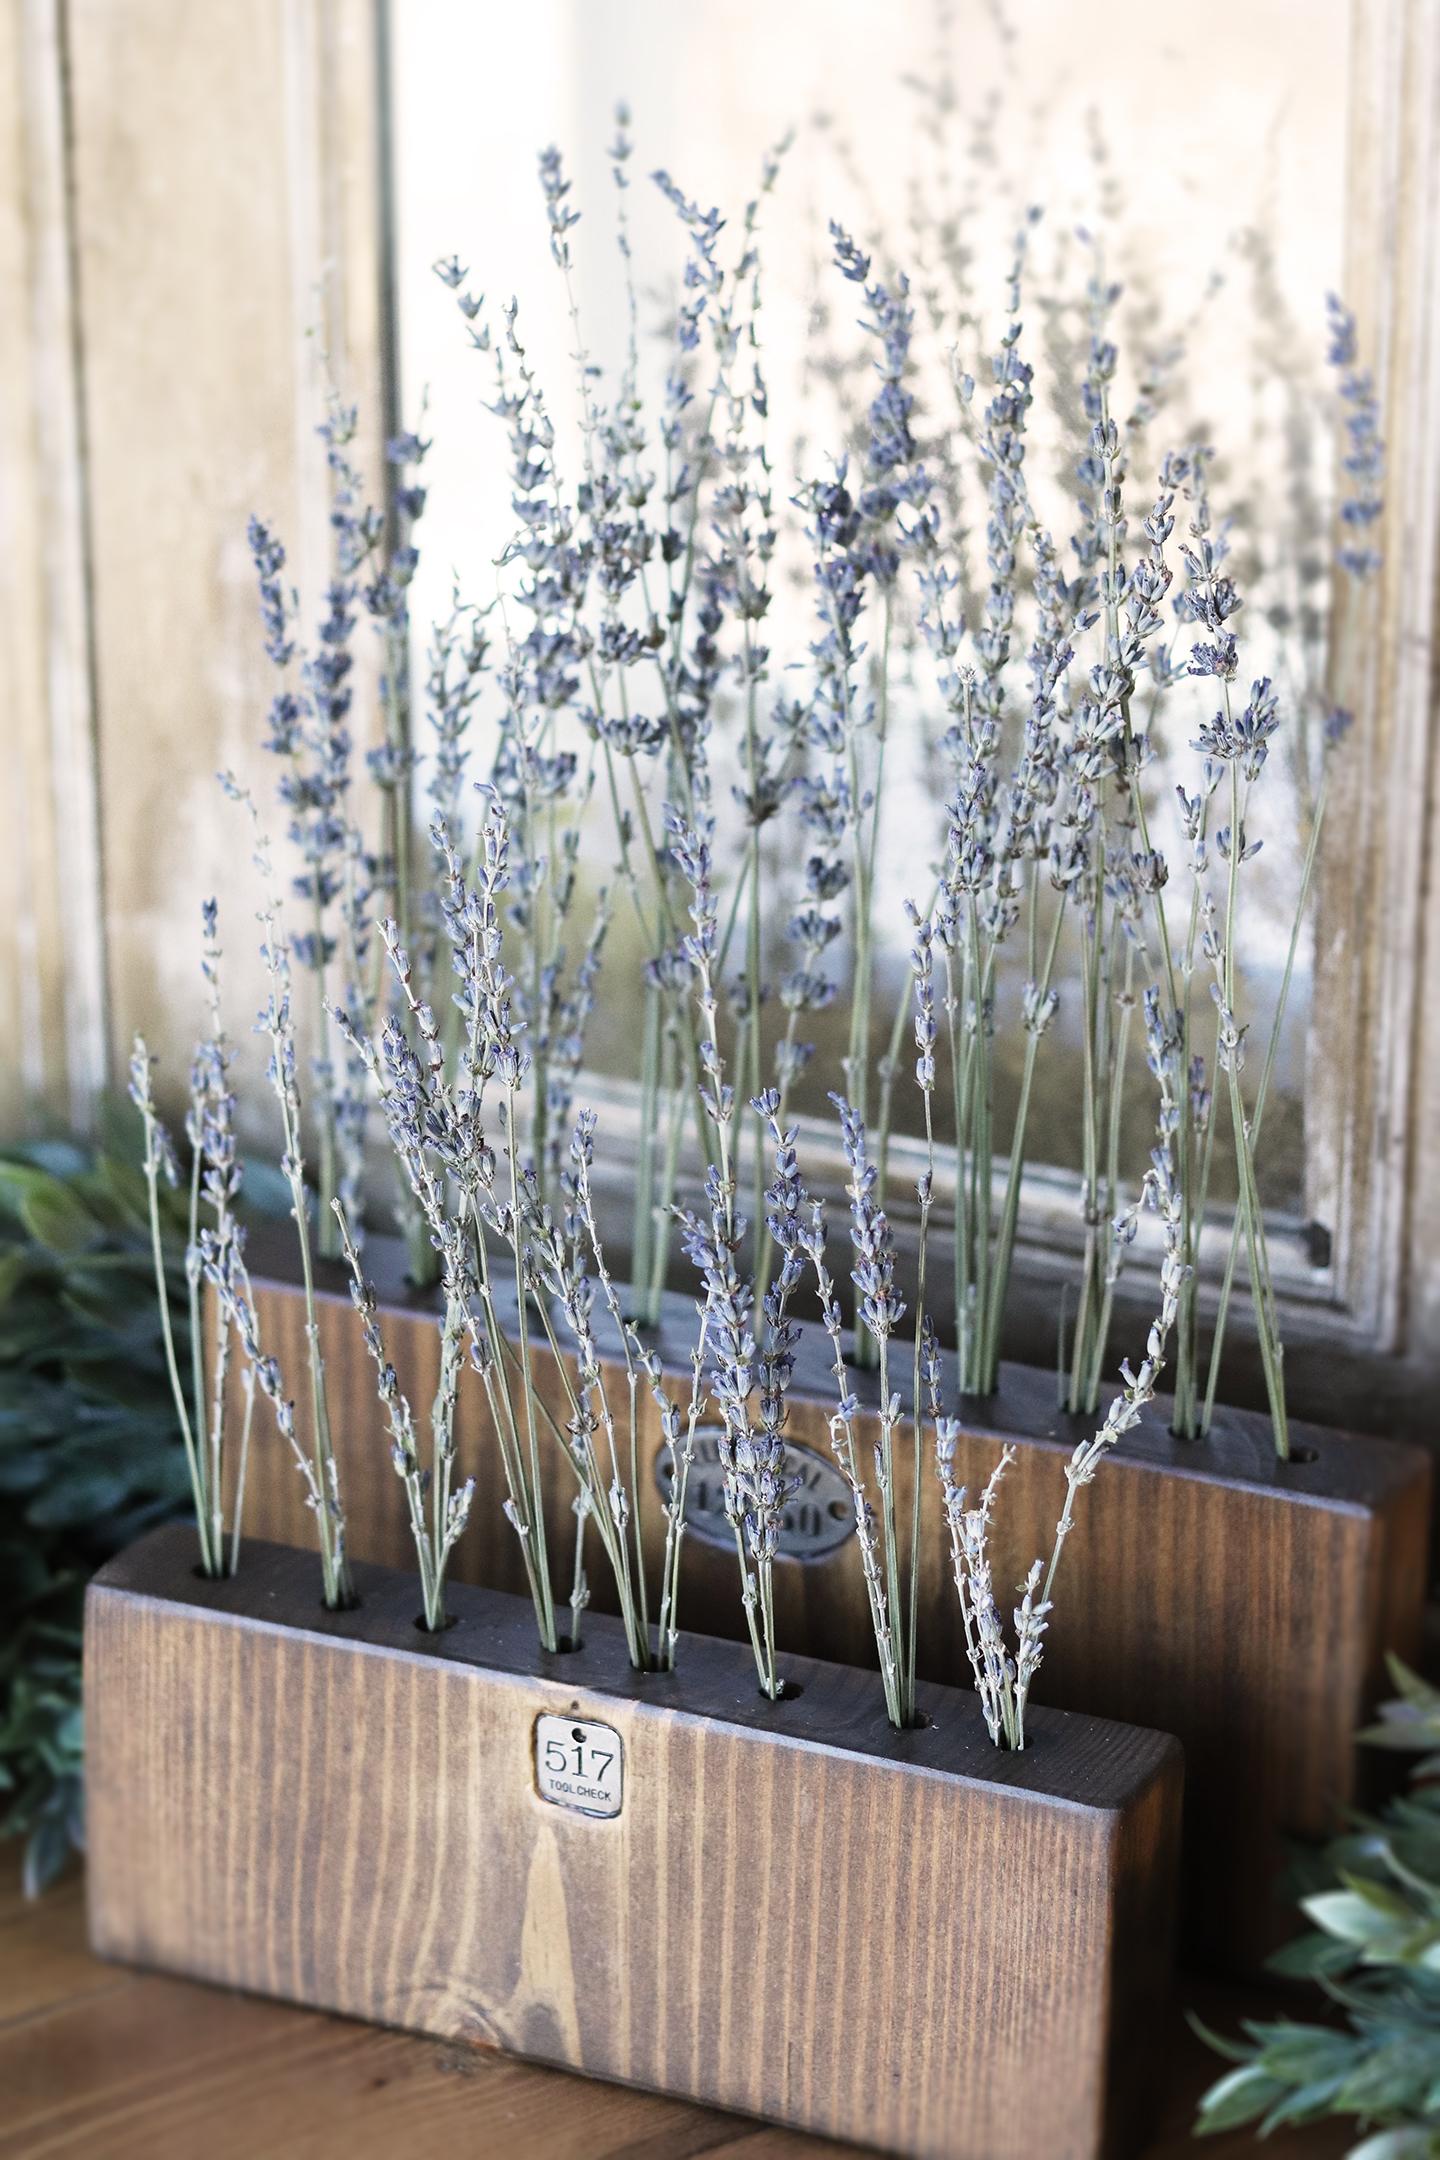 Boroughfare Home Vintage Lavender Set with Metal Number Decals SIDE